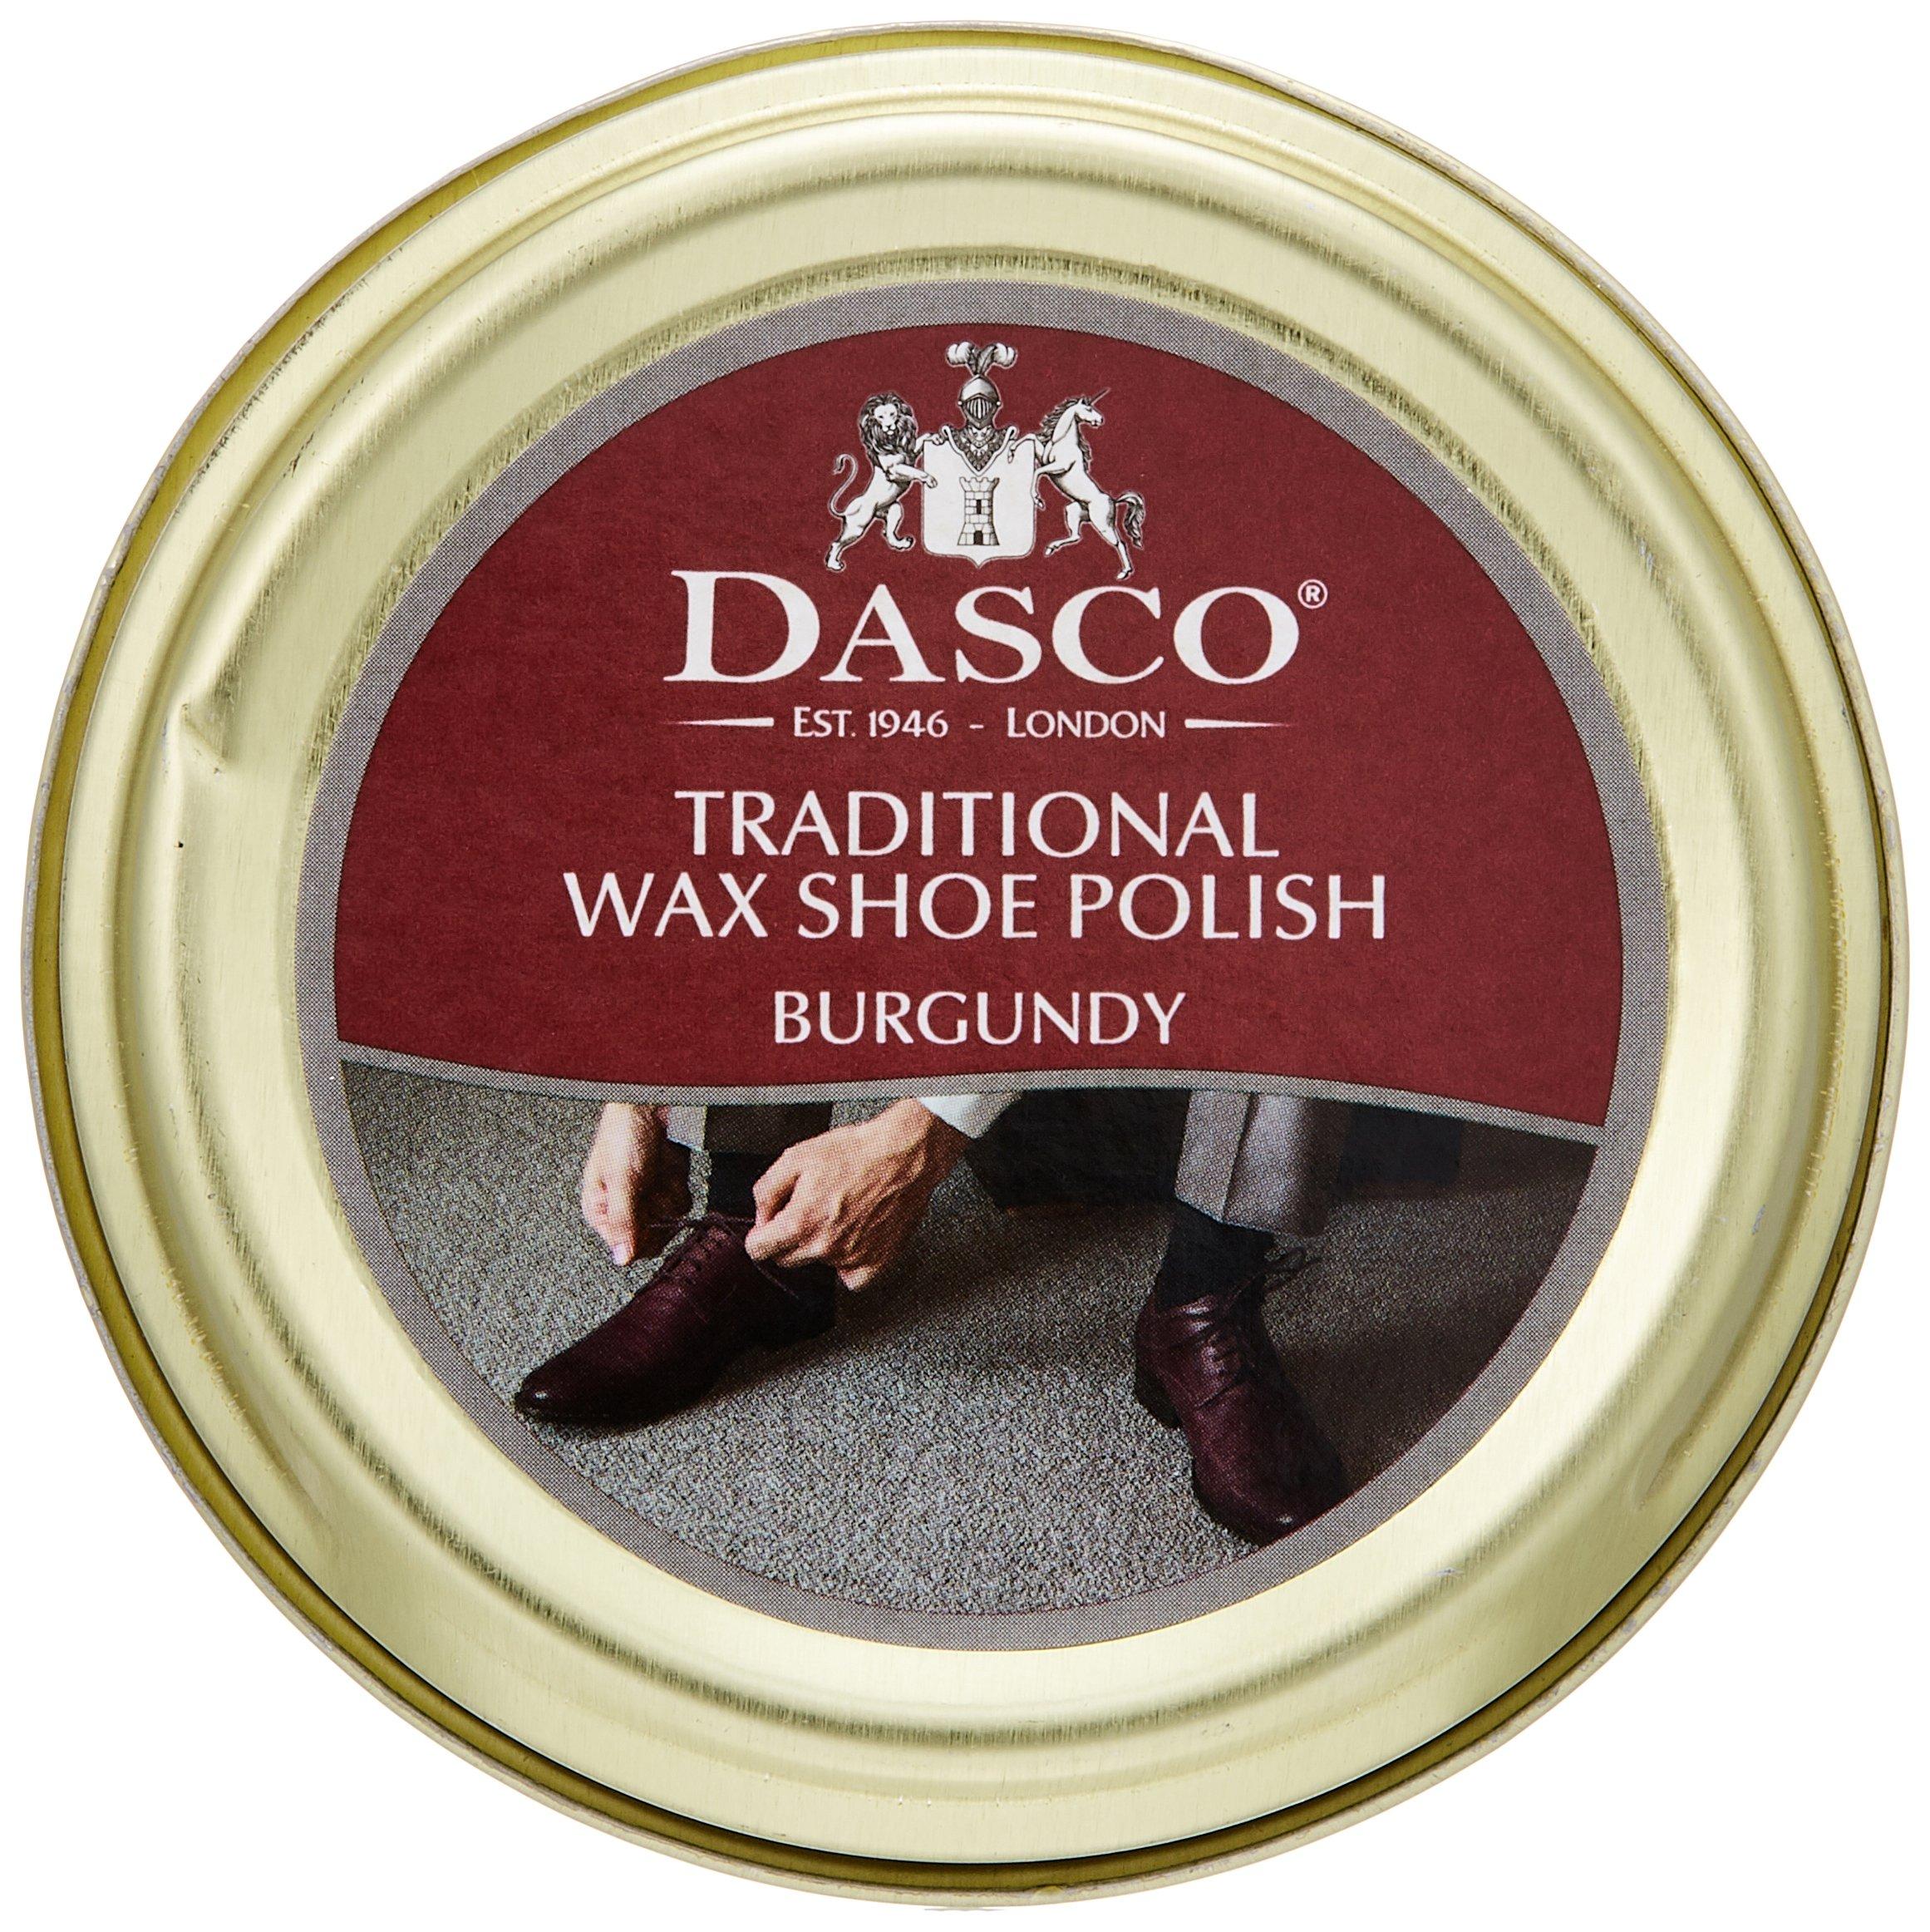 Dasco Traditional Wax Shoe Polish, 50ml tin (Burgundy)